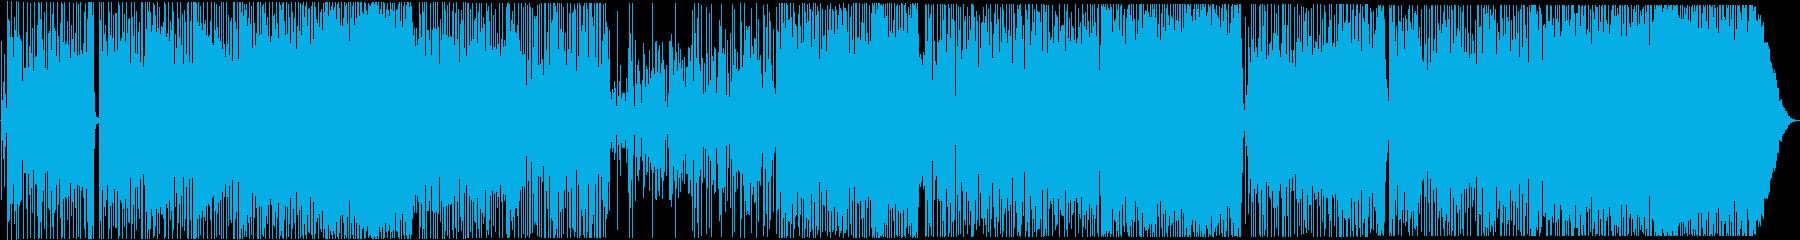 FunkyなJazzチューン!の再生済みの波形